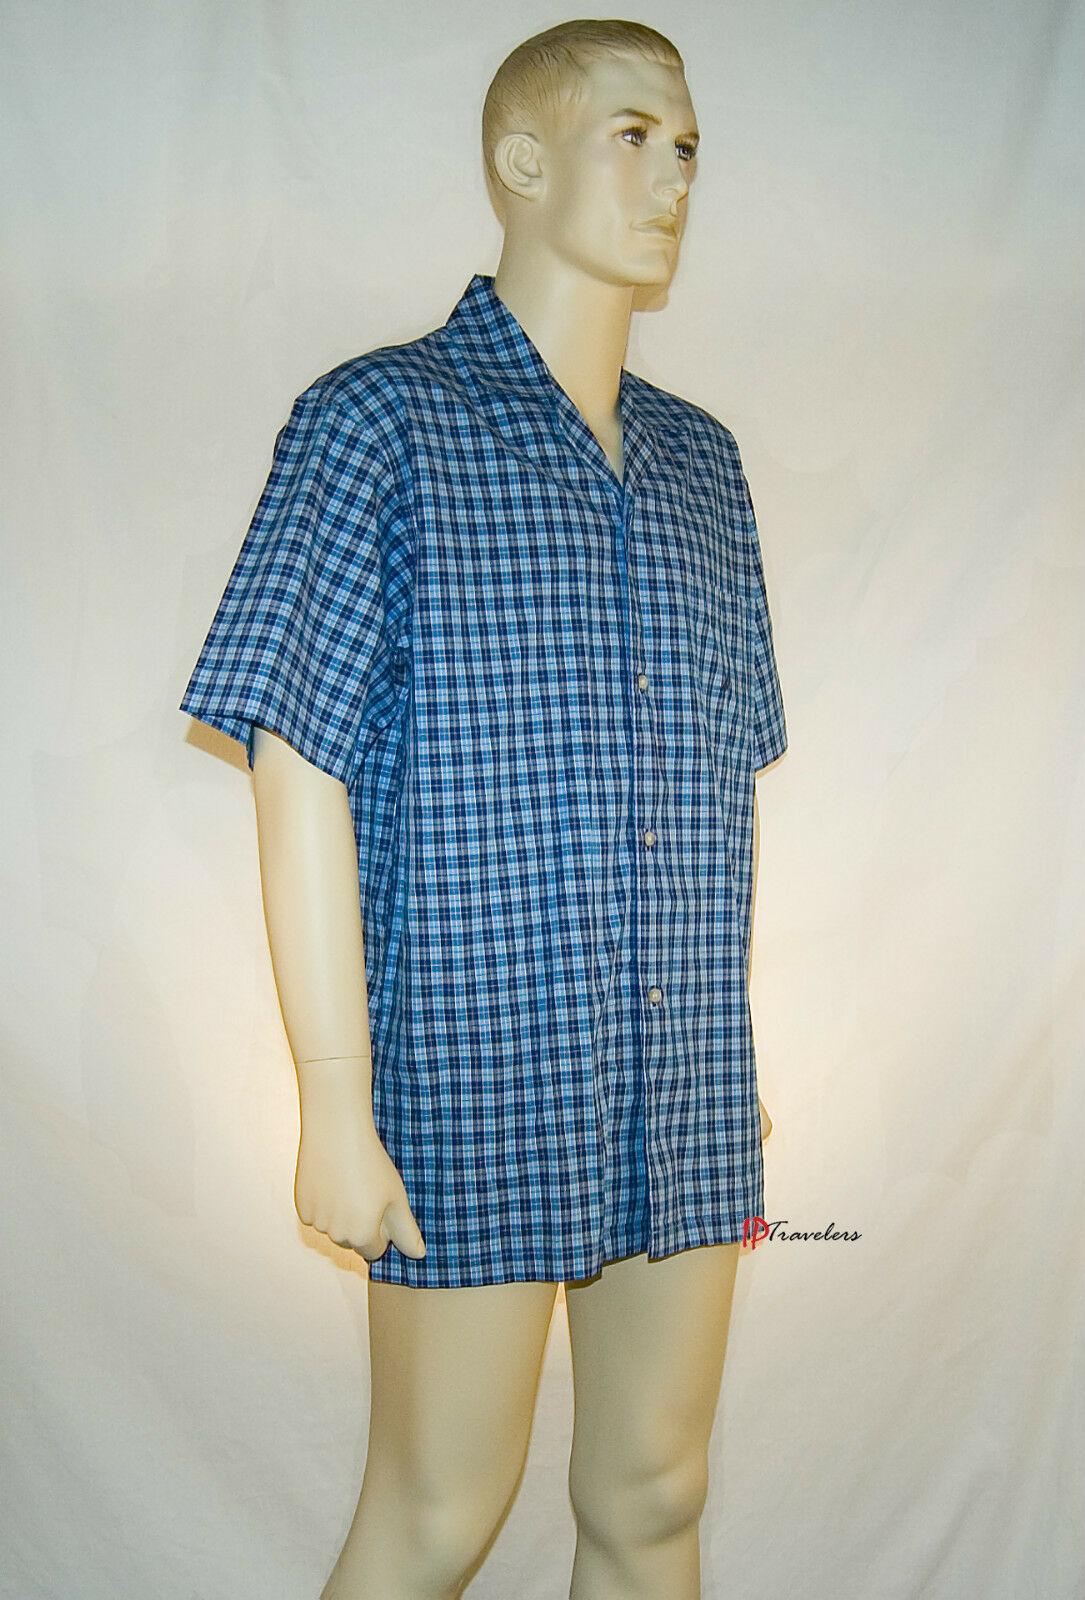 Nautica Men's Sleepwear Shirt Breezy Blue Checkered 100% Cotton Medium $36